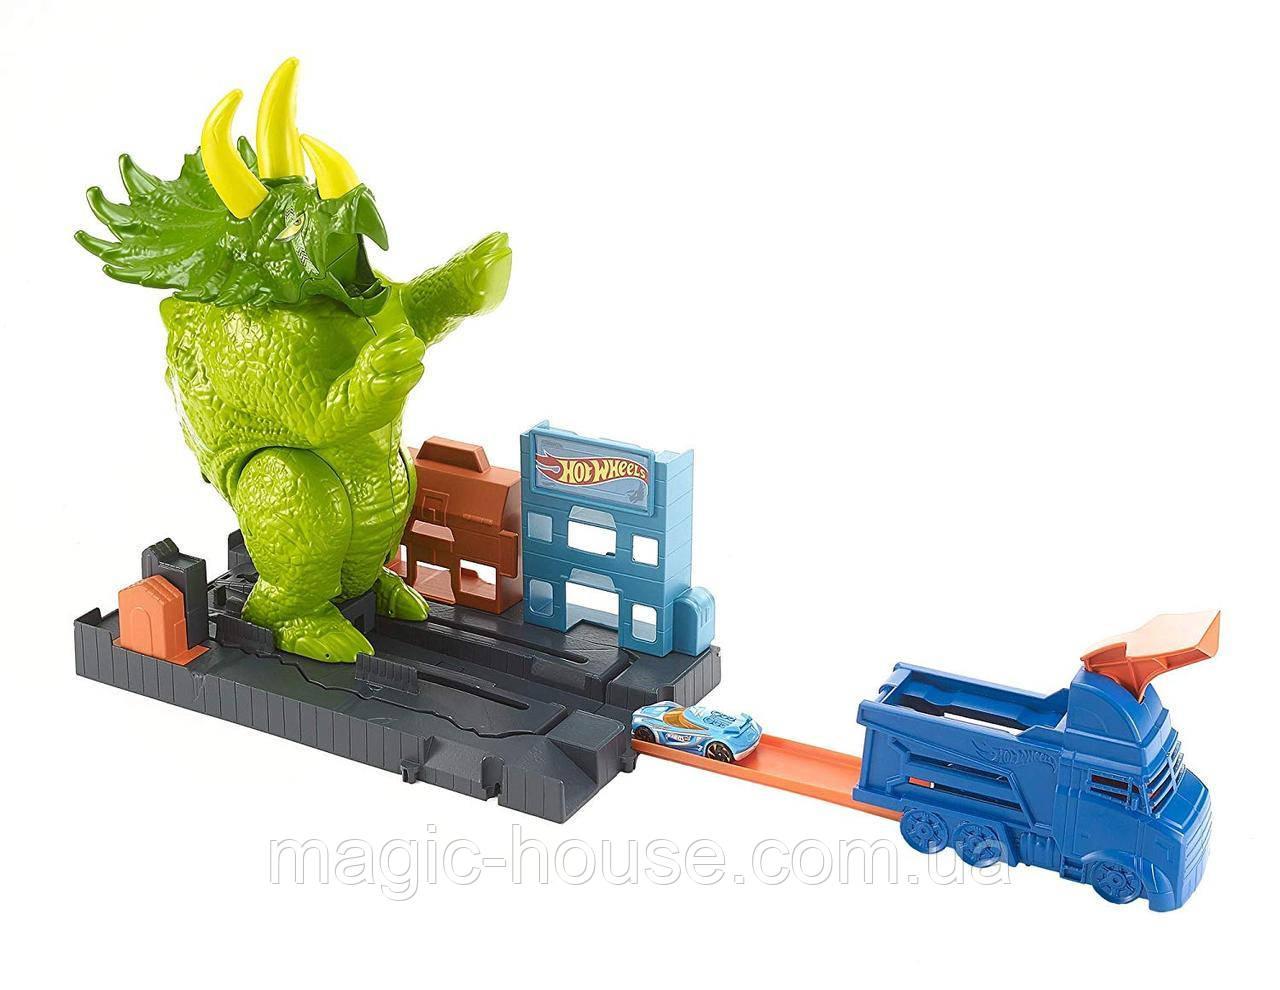 Трек Хот Вилс Разгневанный Трицератопс Hot Wheels Smashin Triceratops Оригинал от Mattel